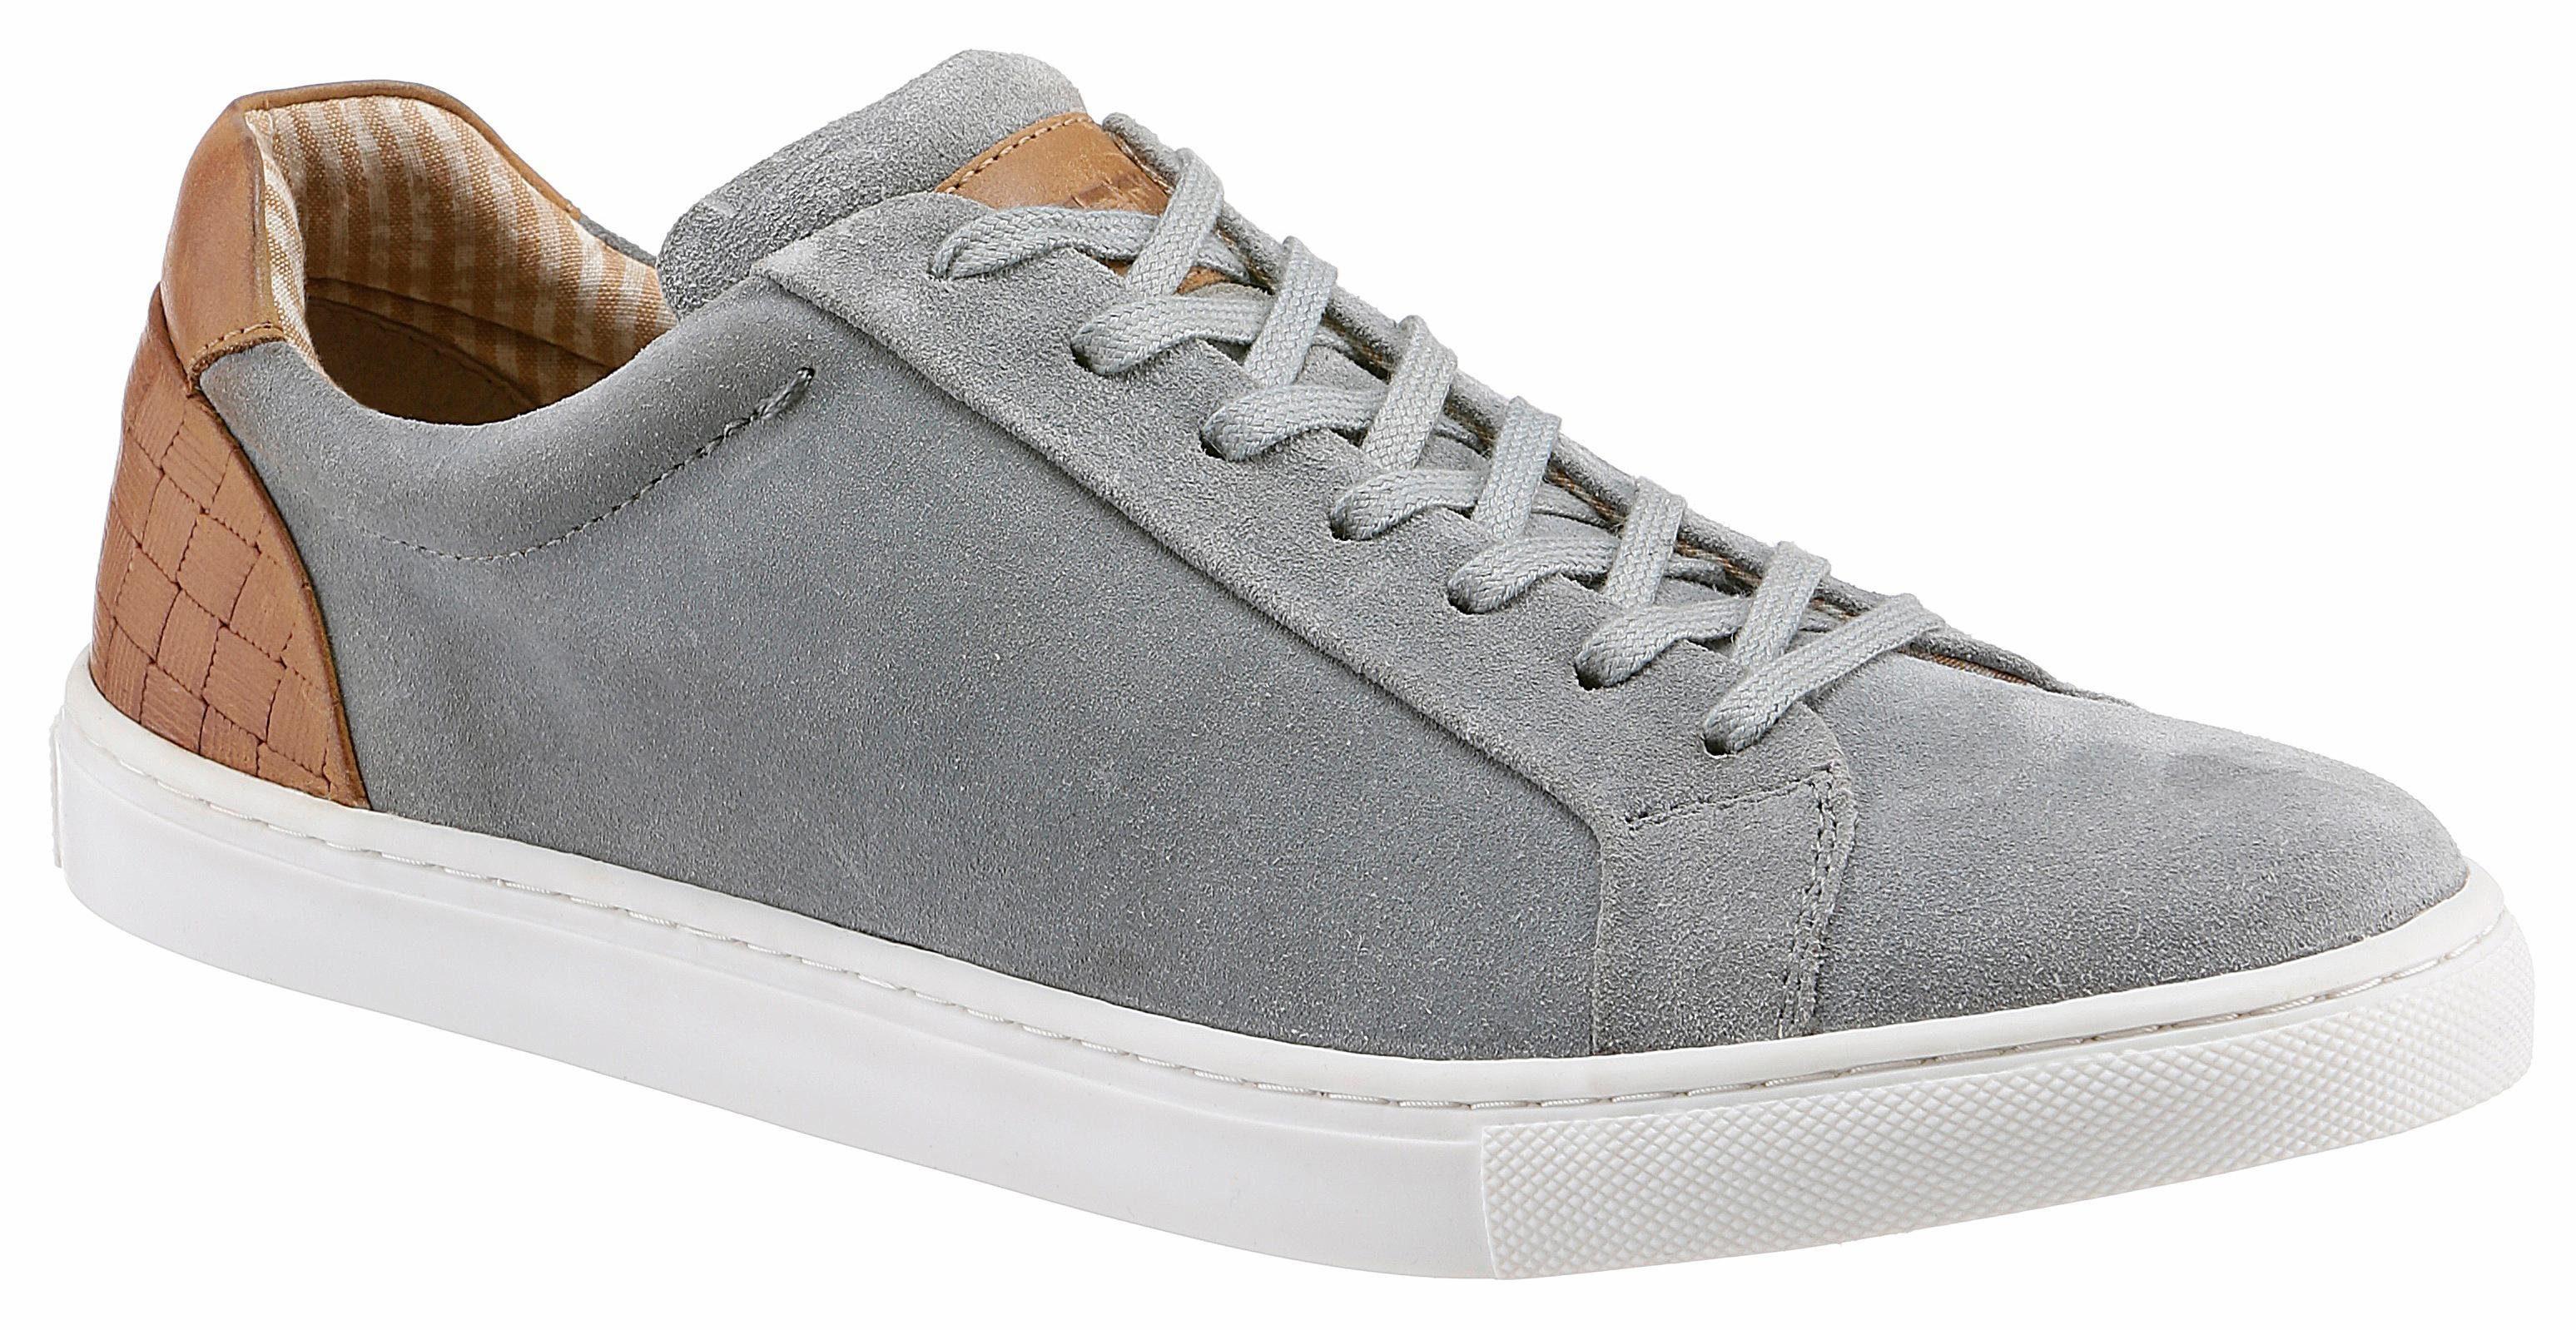 PETROLIO Sneaker, mit angesagter Flechtoptik  grau